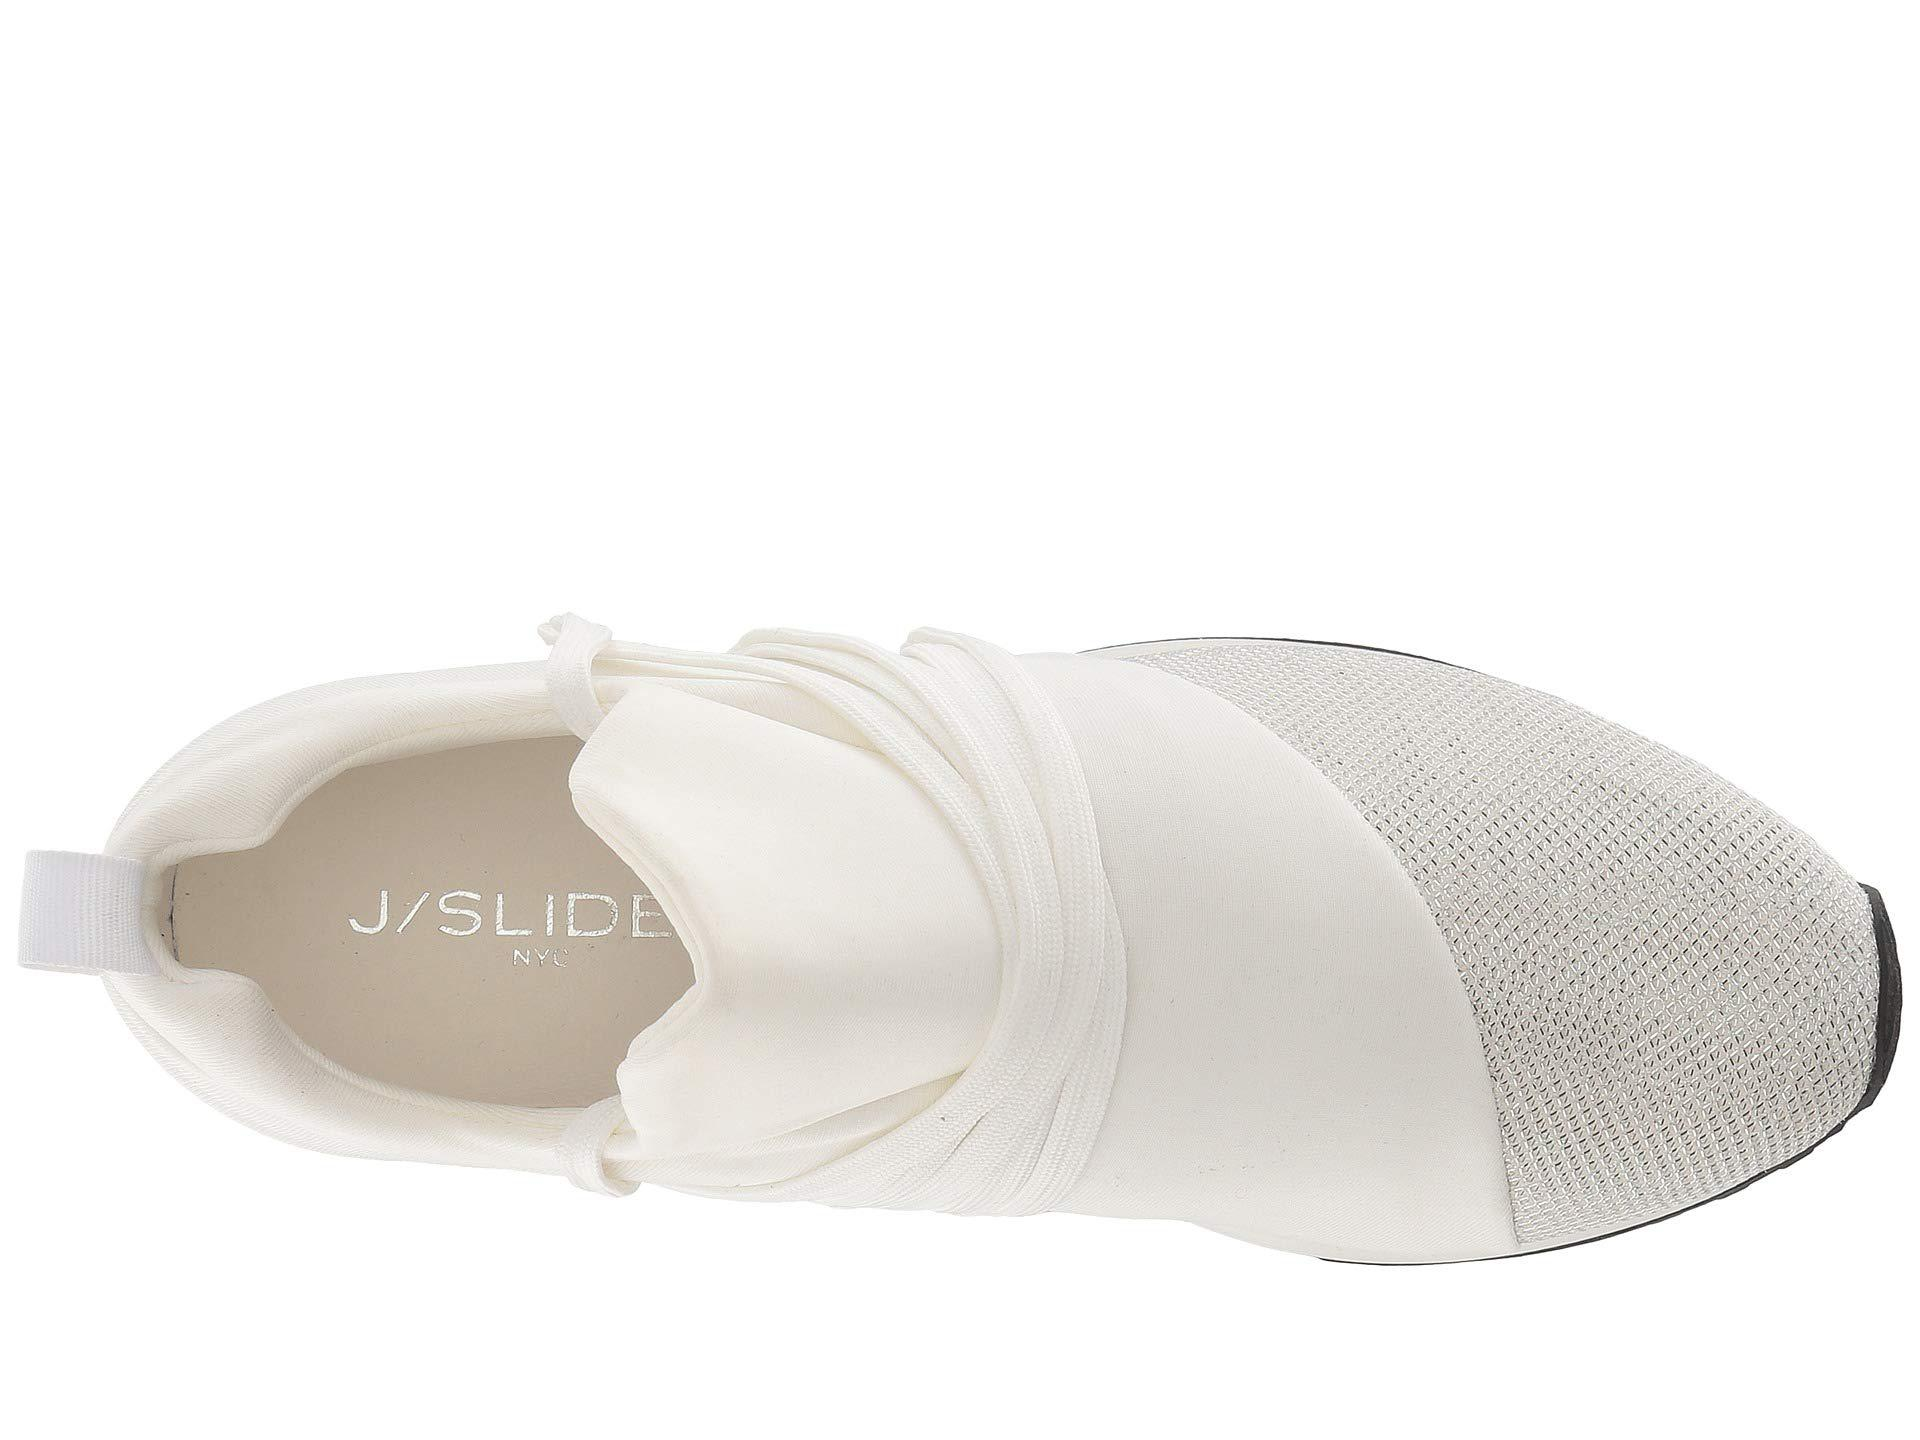 8ead17a480aae J/Slides Zorro (white) Shoes